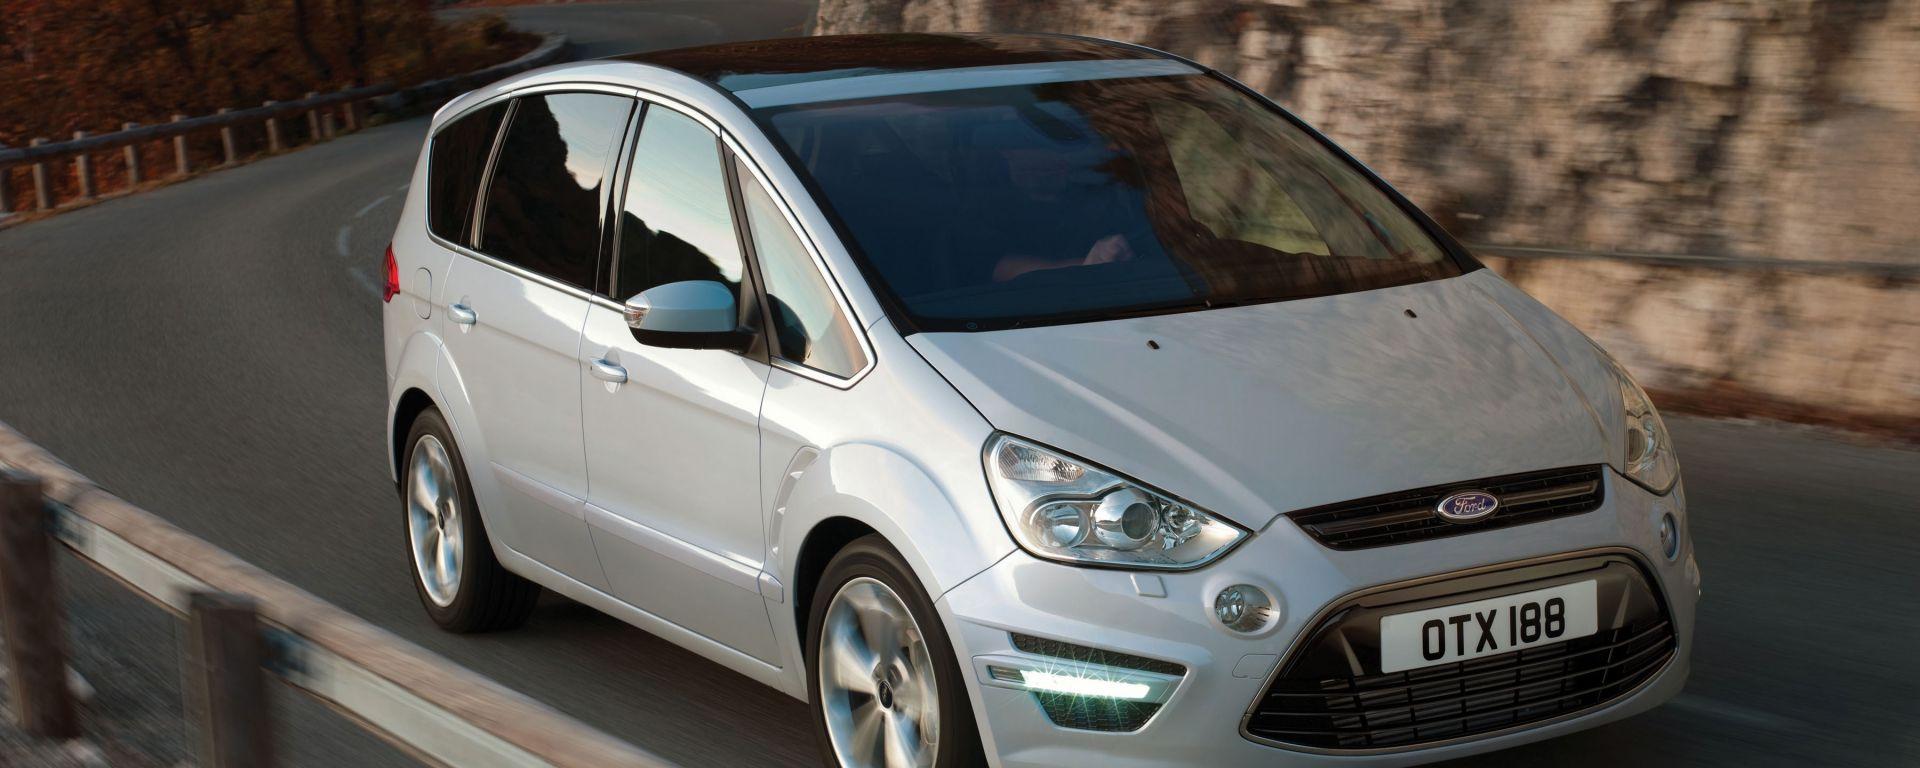 test drive ford s max 2 0 ecoboost motorbox. Black Bedroom Furniture Sets. Home Design Ideas